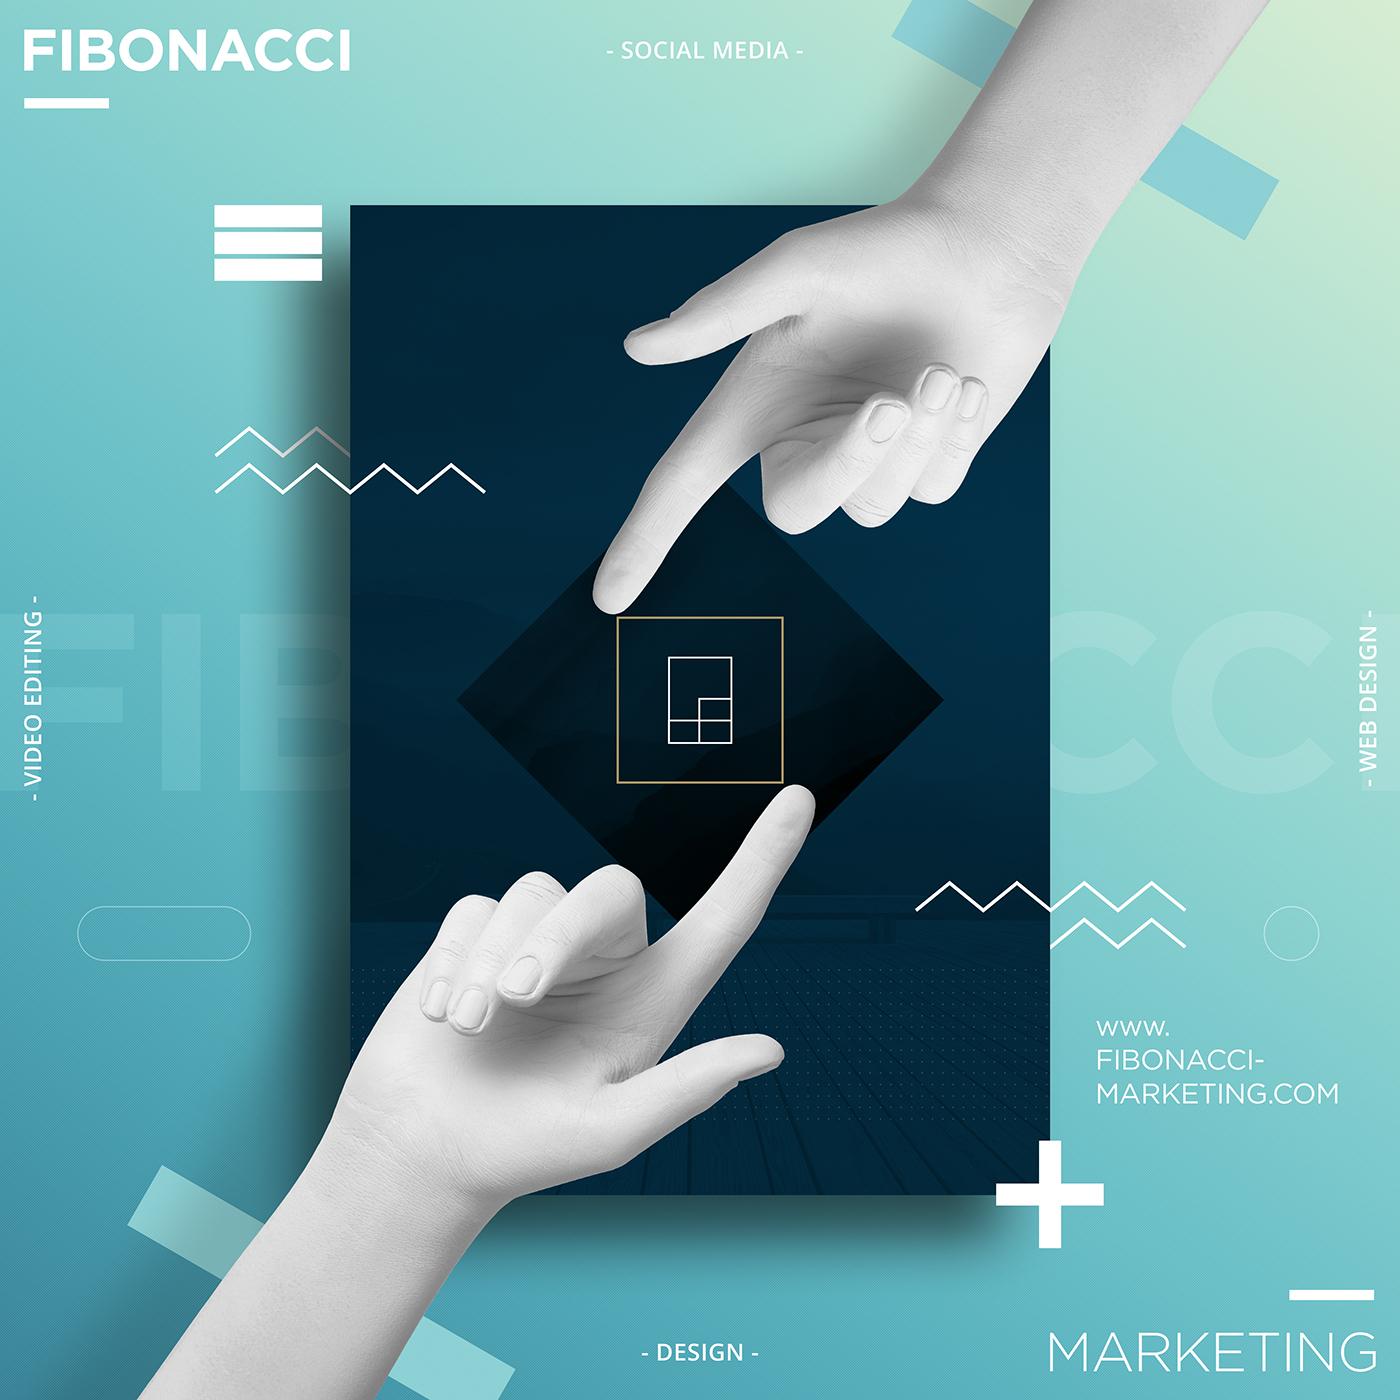 Fibonacci Marketing Post on